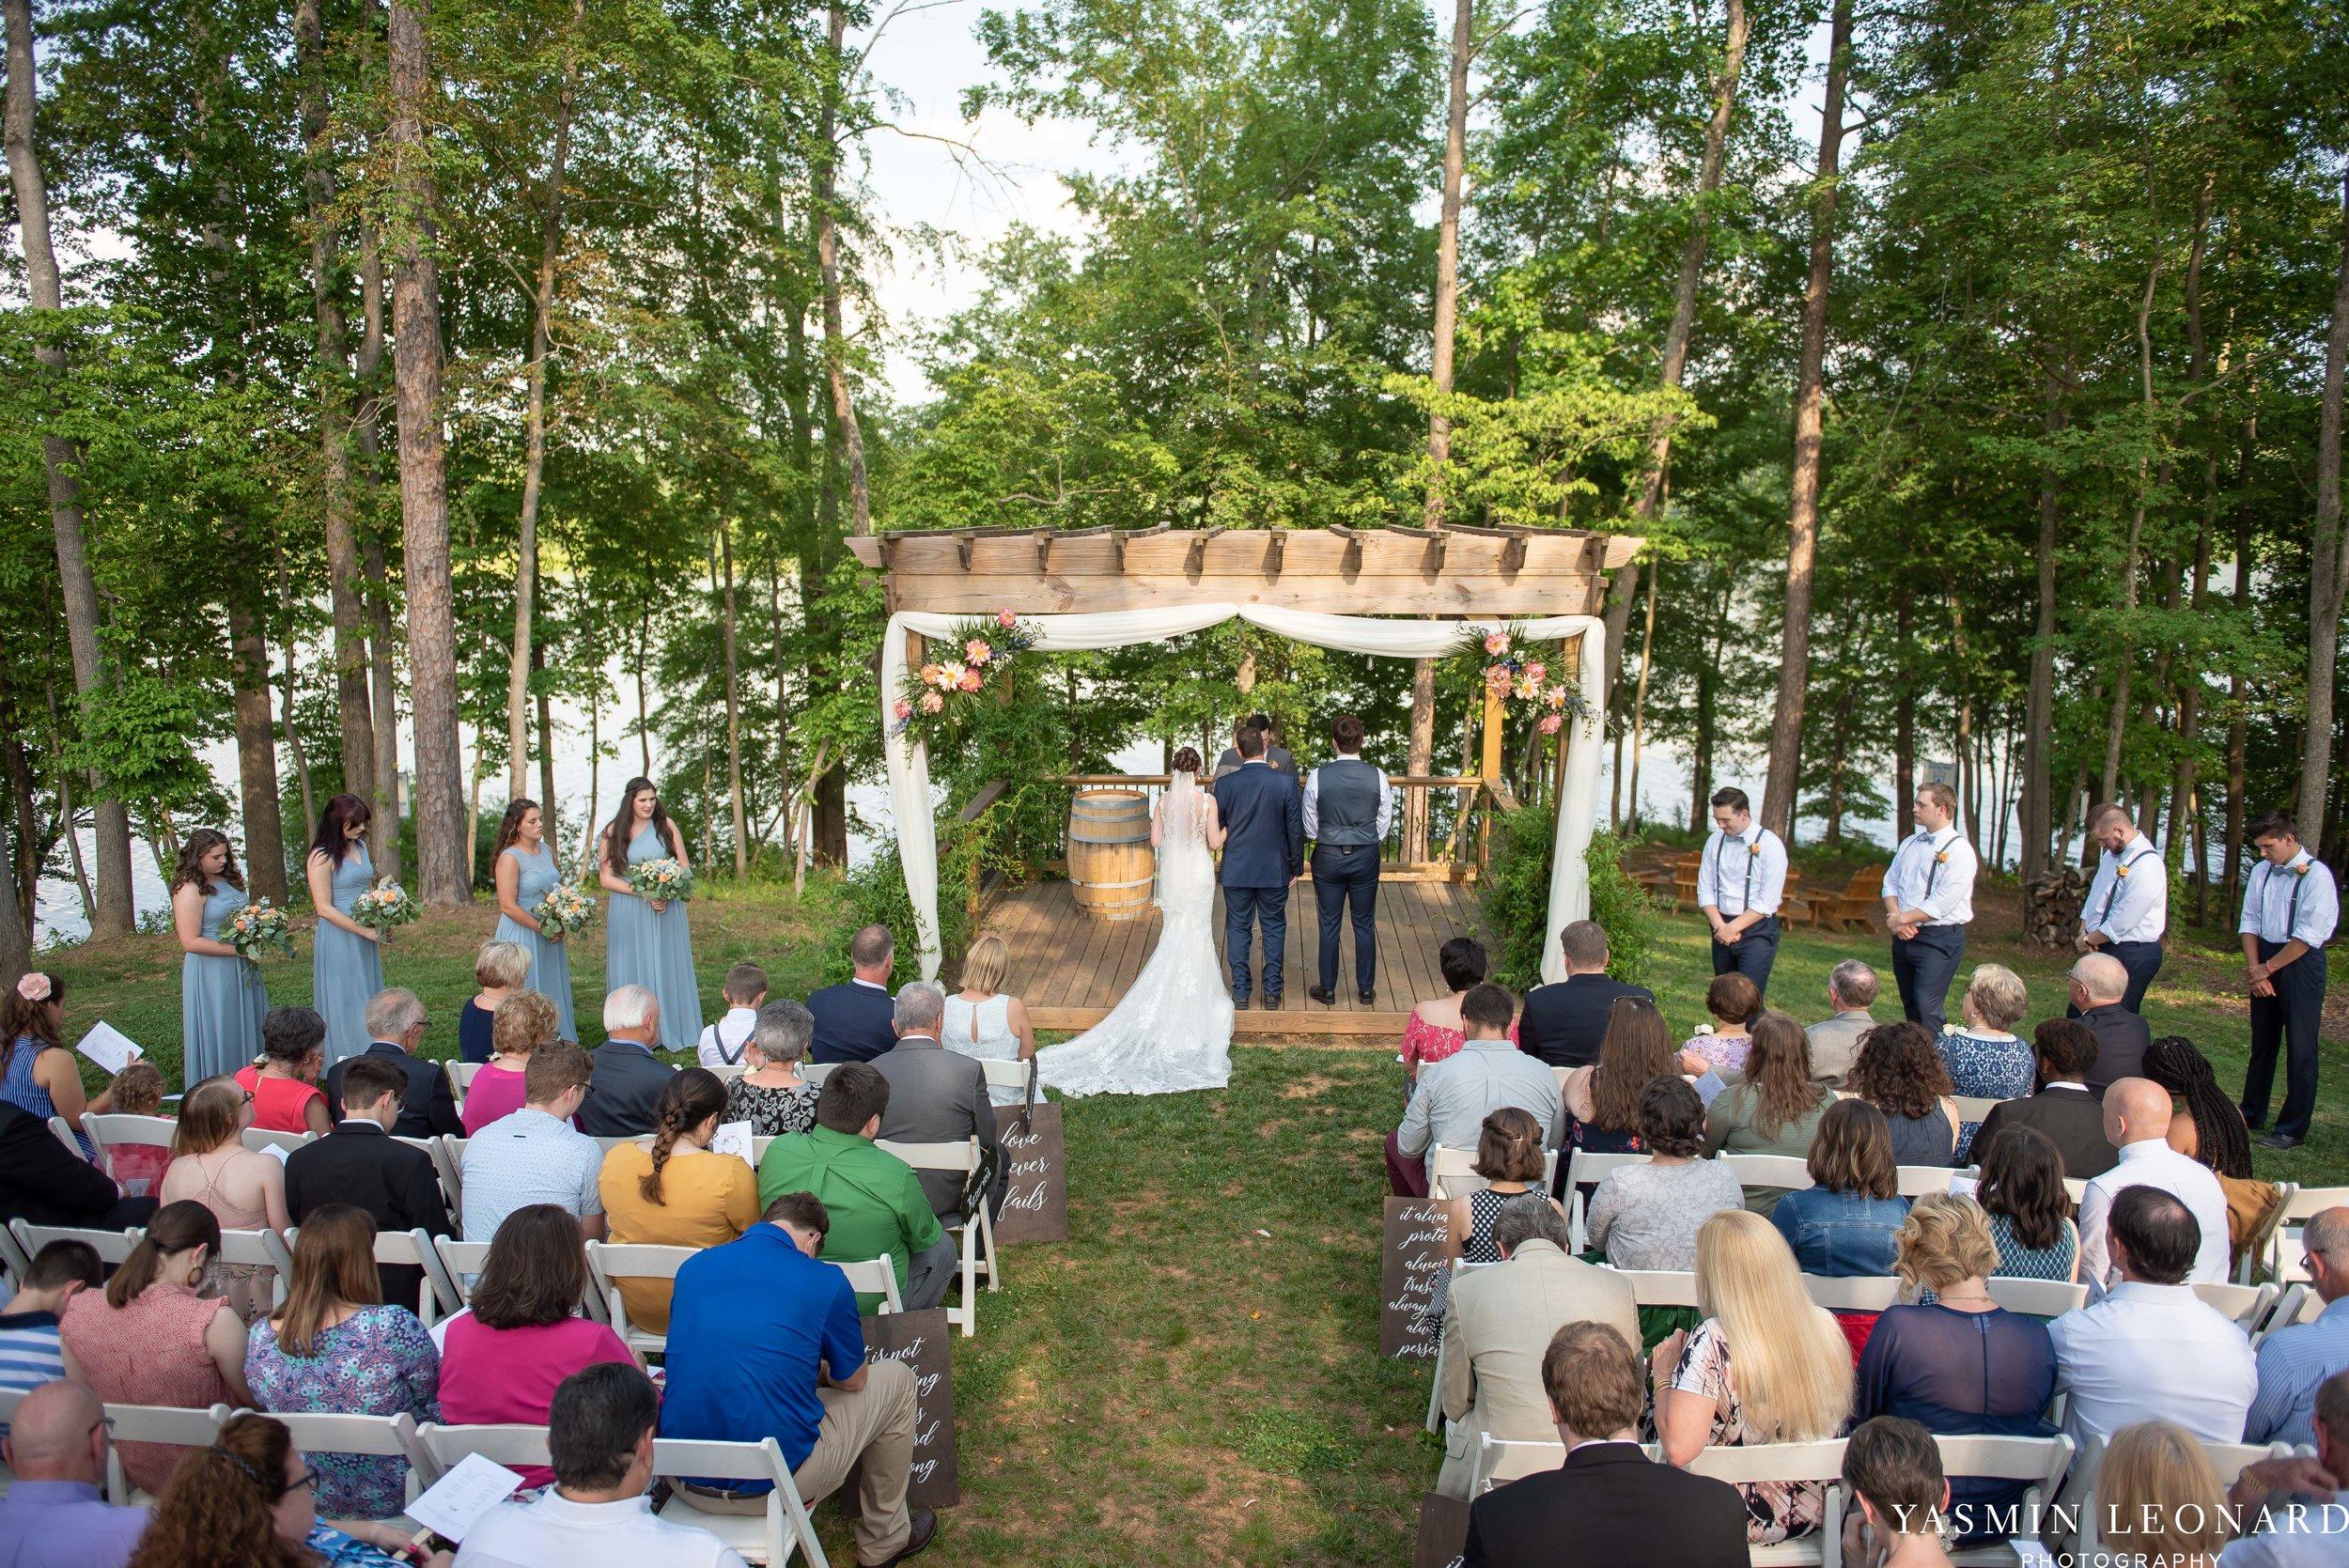 Old Homeplace Vineyard - NC Weddings - Outdoor Summer Weddings - Peony Boutique - Vineyard Wedding - NC Photographer - Yasmin Leonard Photography-29.jpg